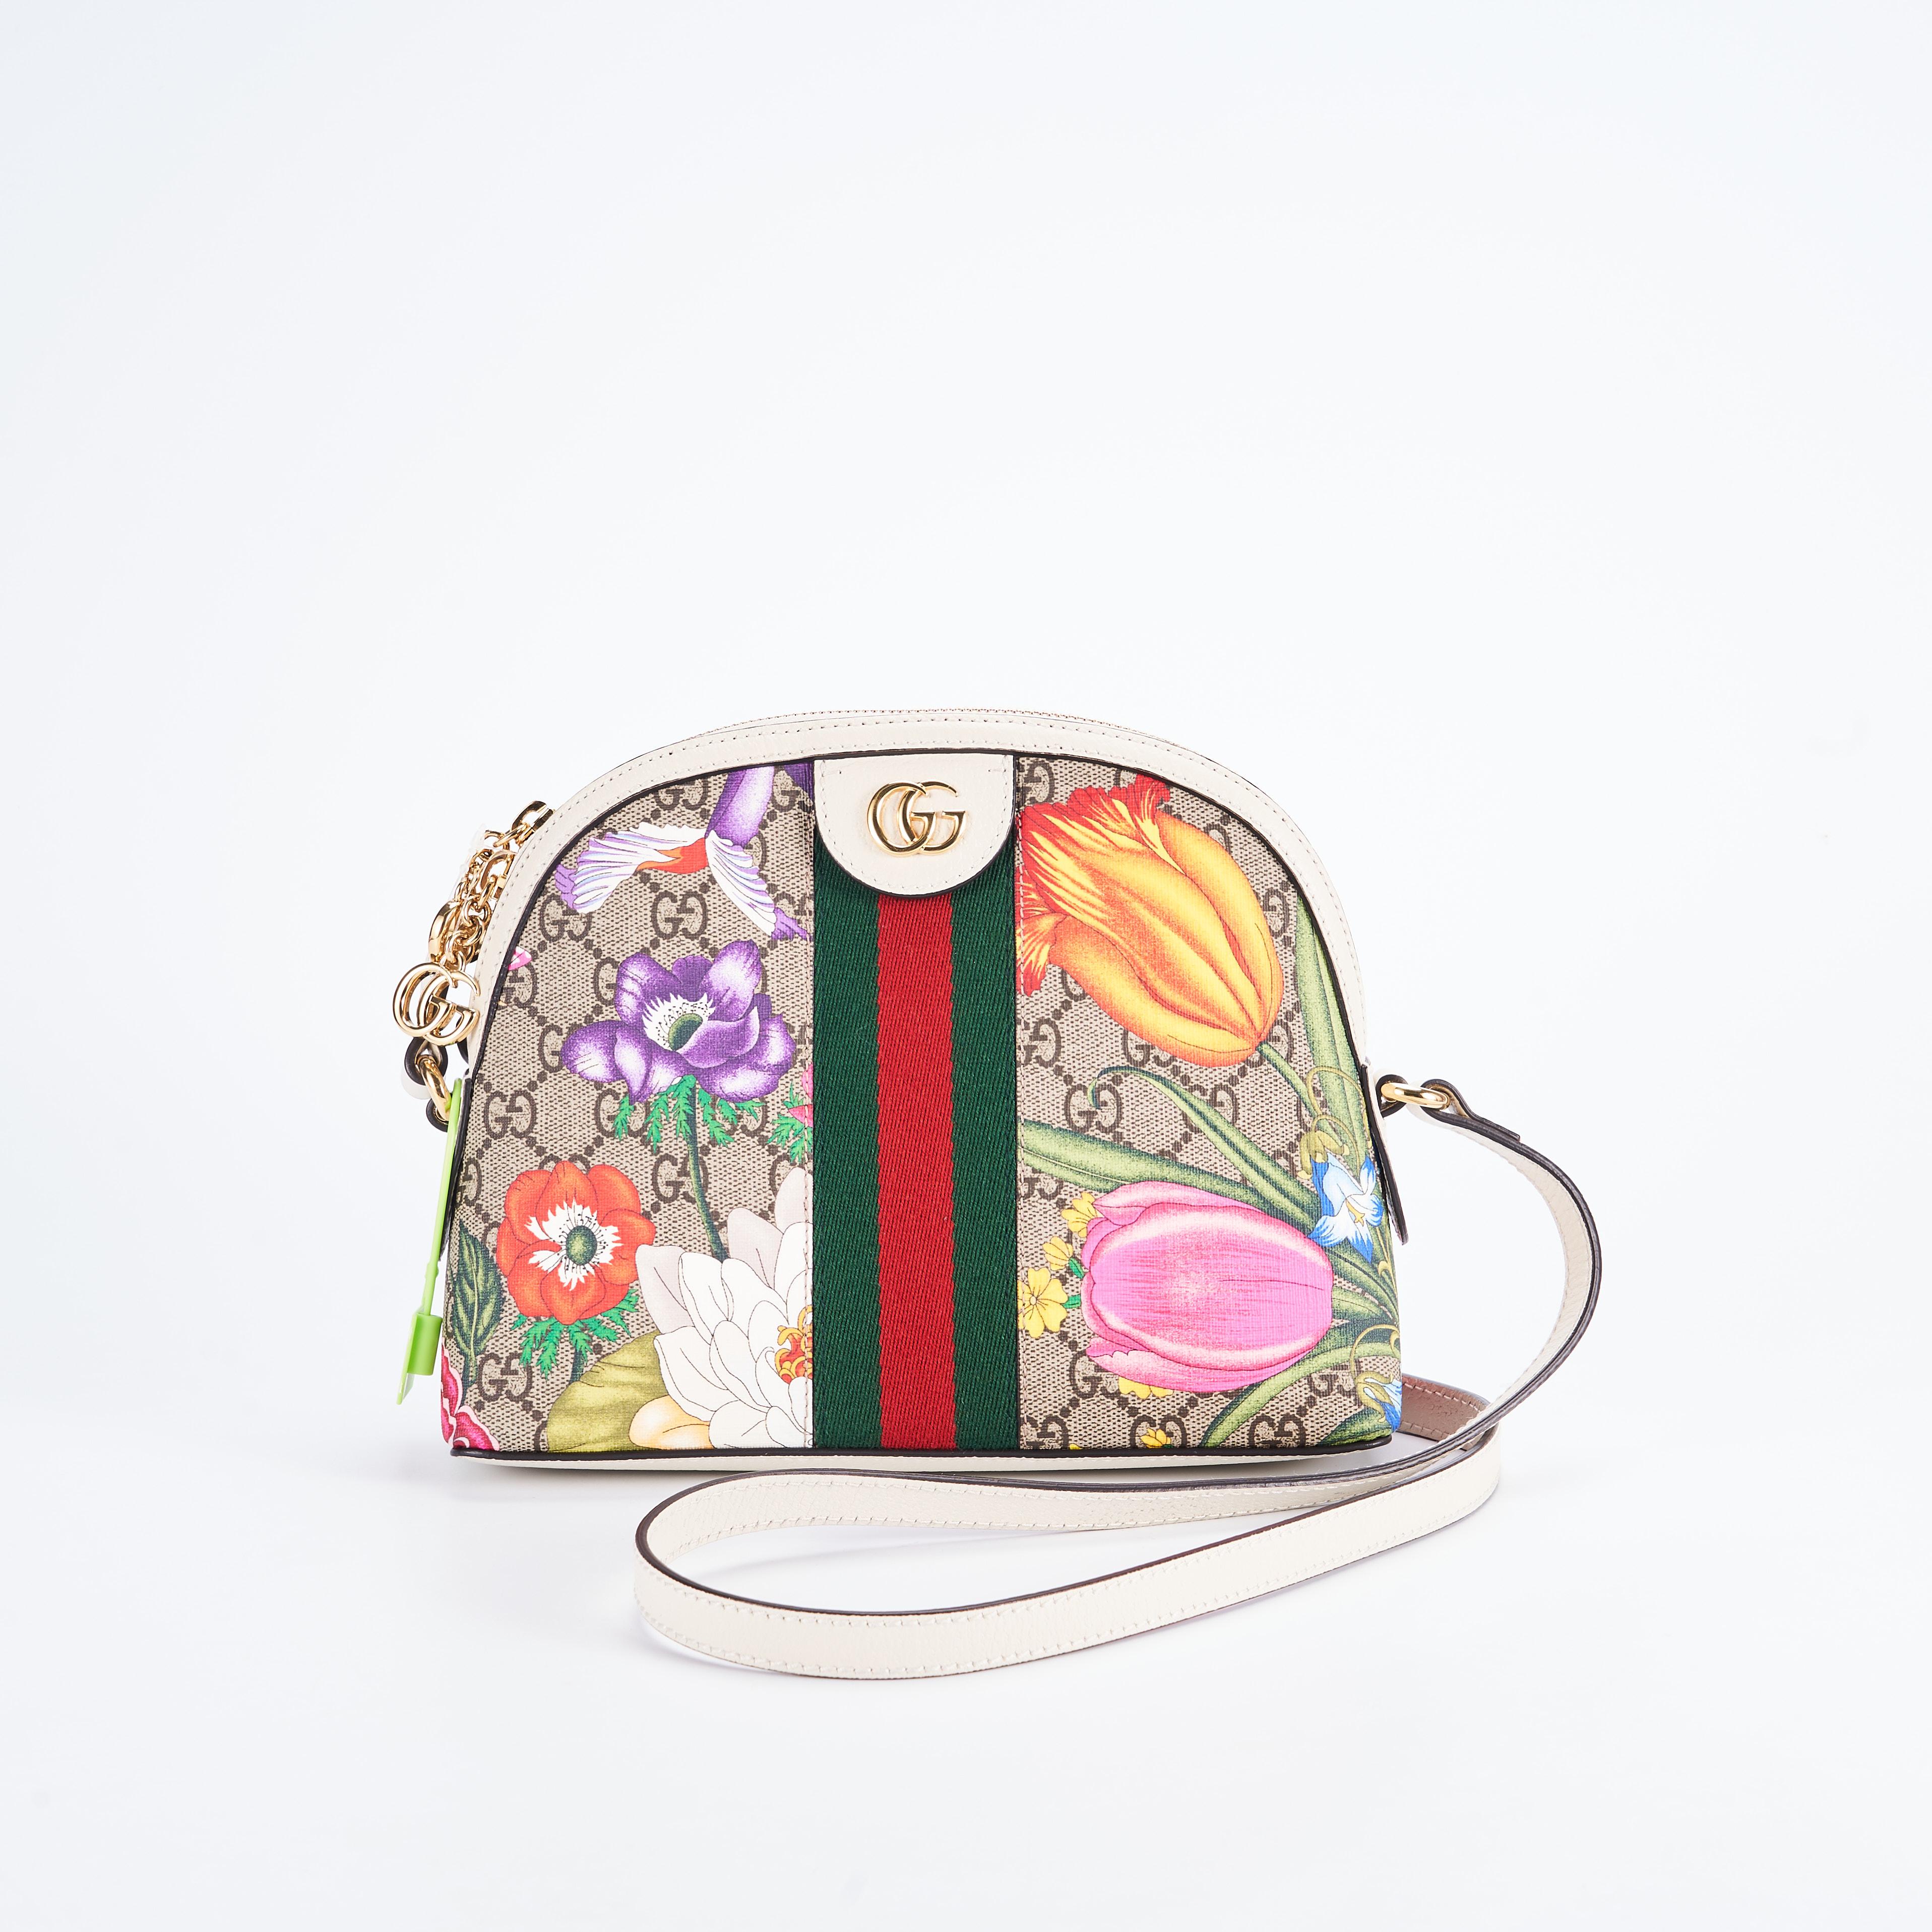 gucci贝壳包 临时【准新】Gucci 花卉贝壳包 23.8.19 公价¥14890_推荐淘宝好看的gucci贝壳包